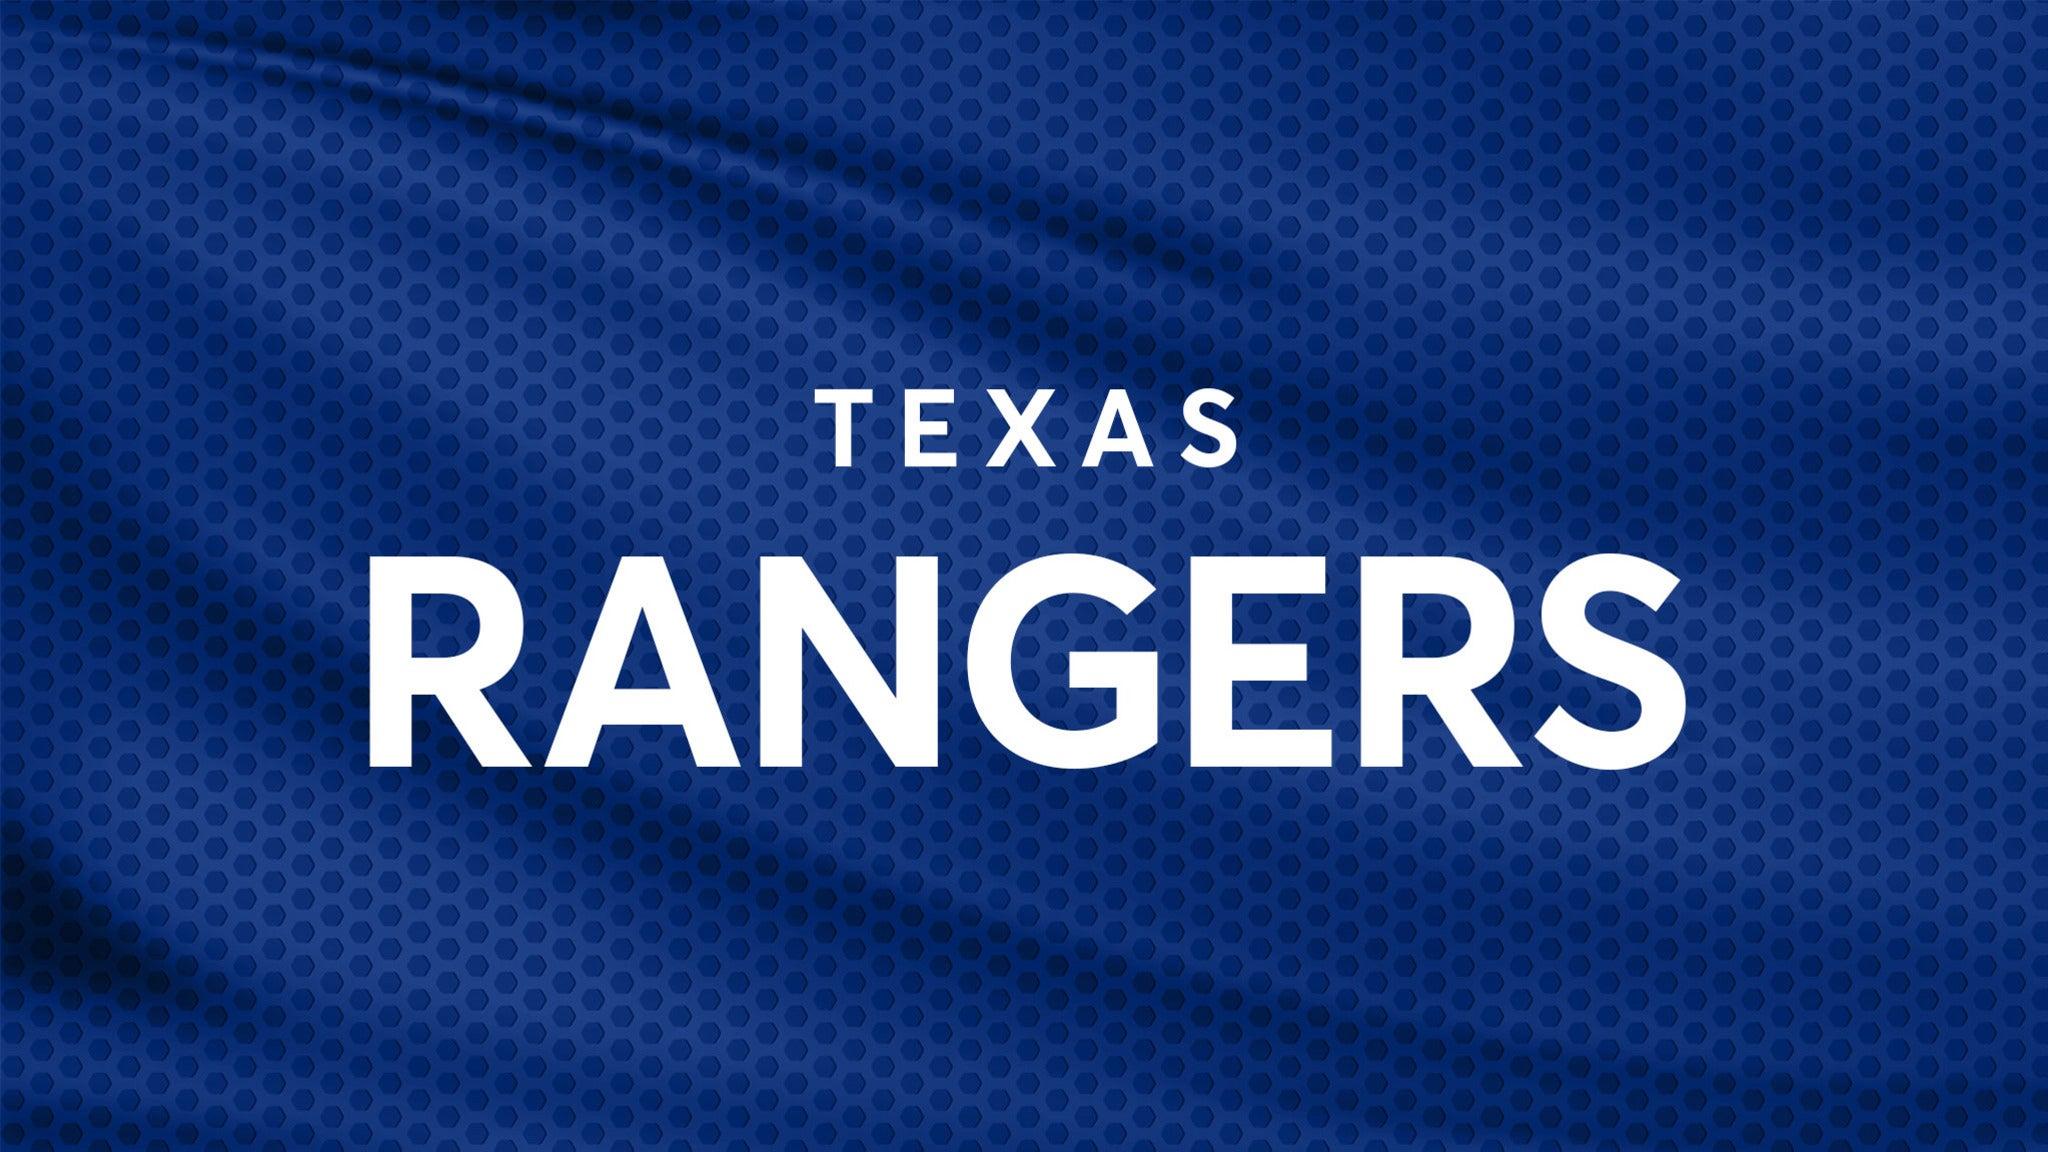 Texas Rangers vs. Los Angeles Angels